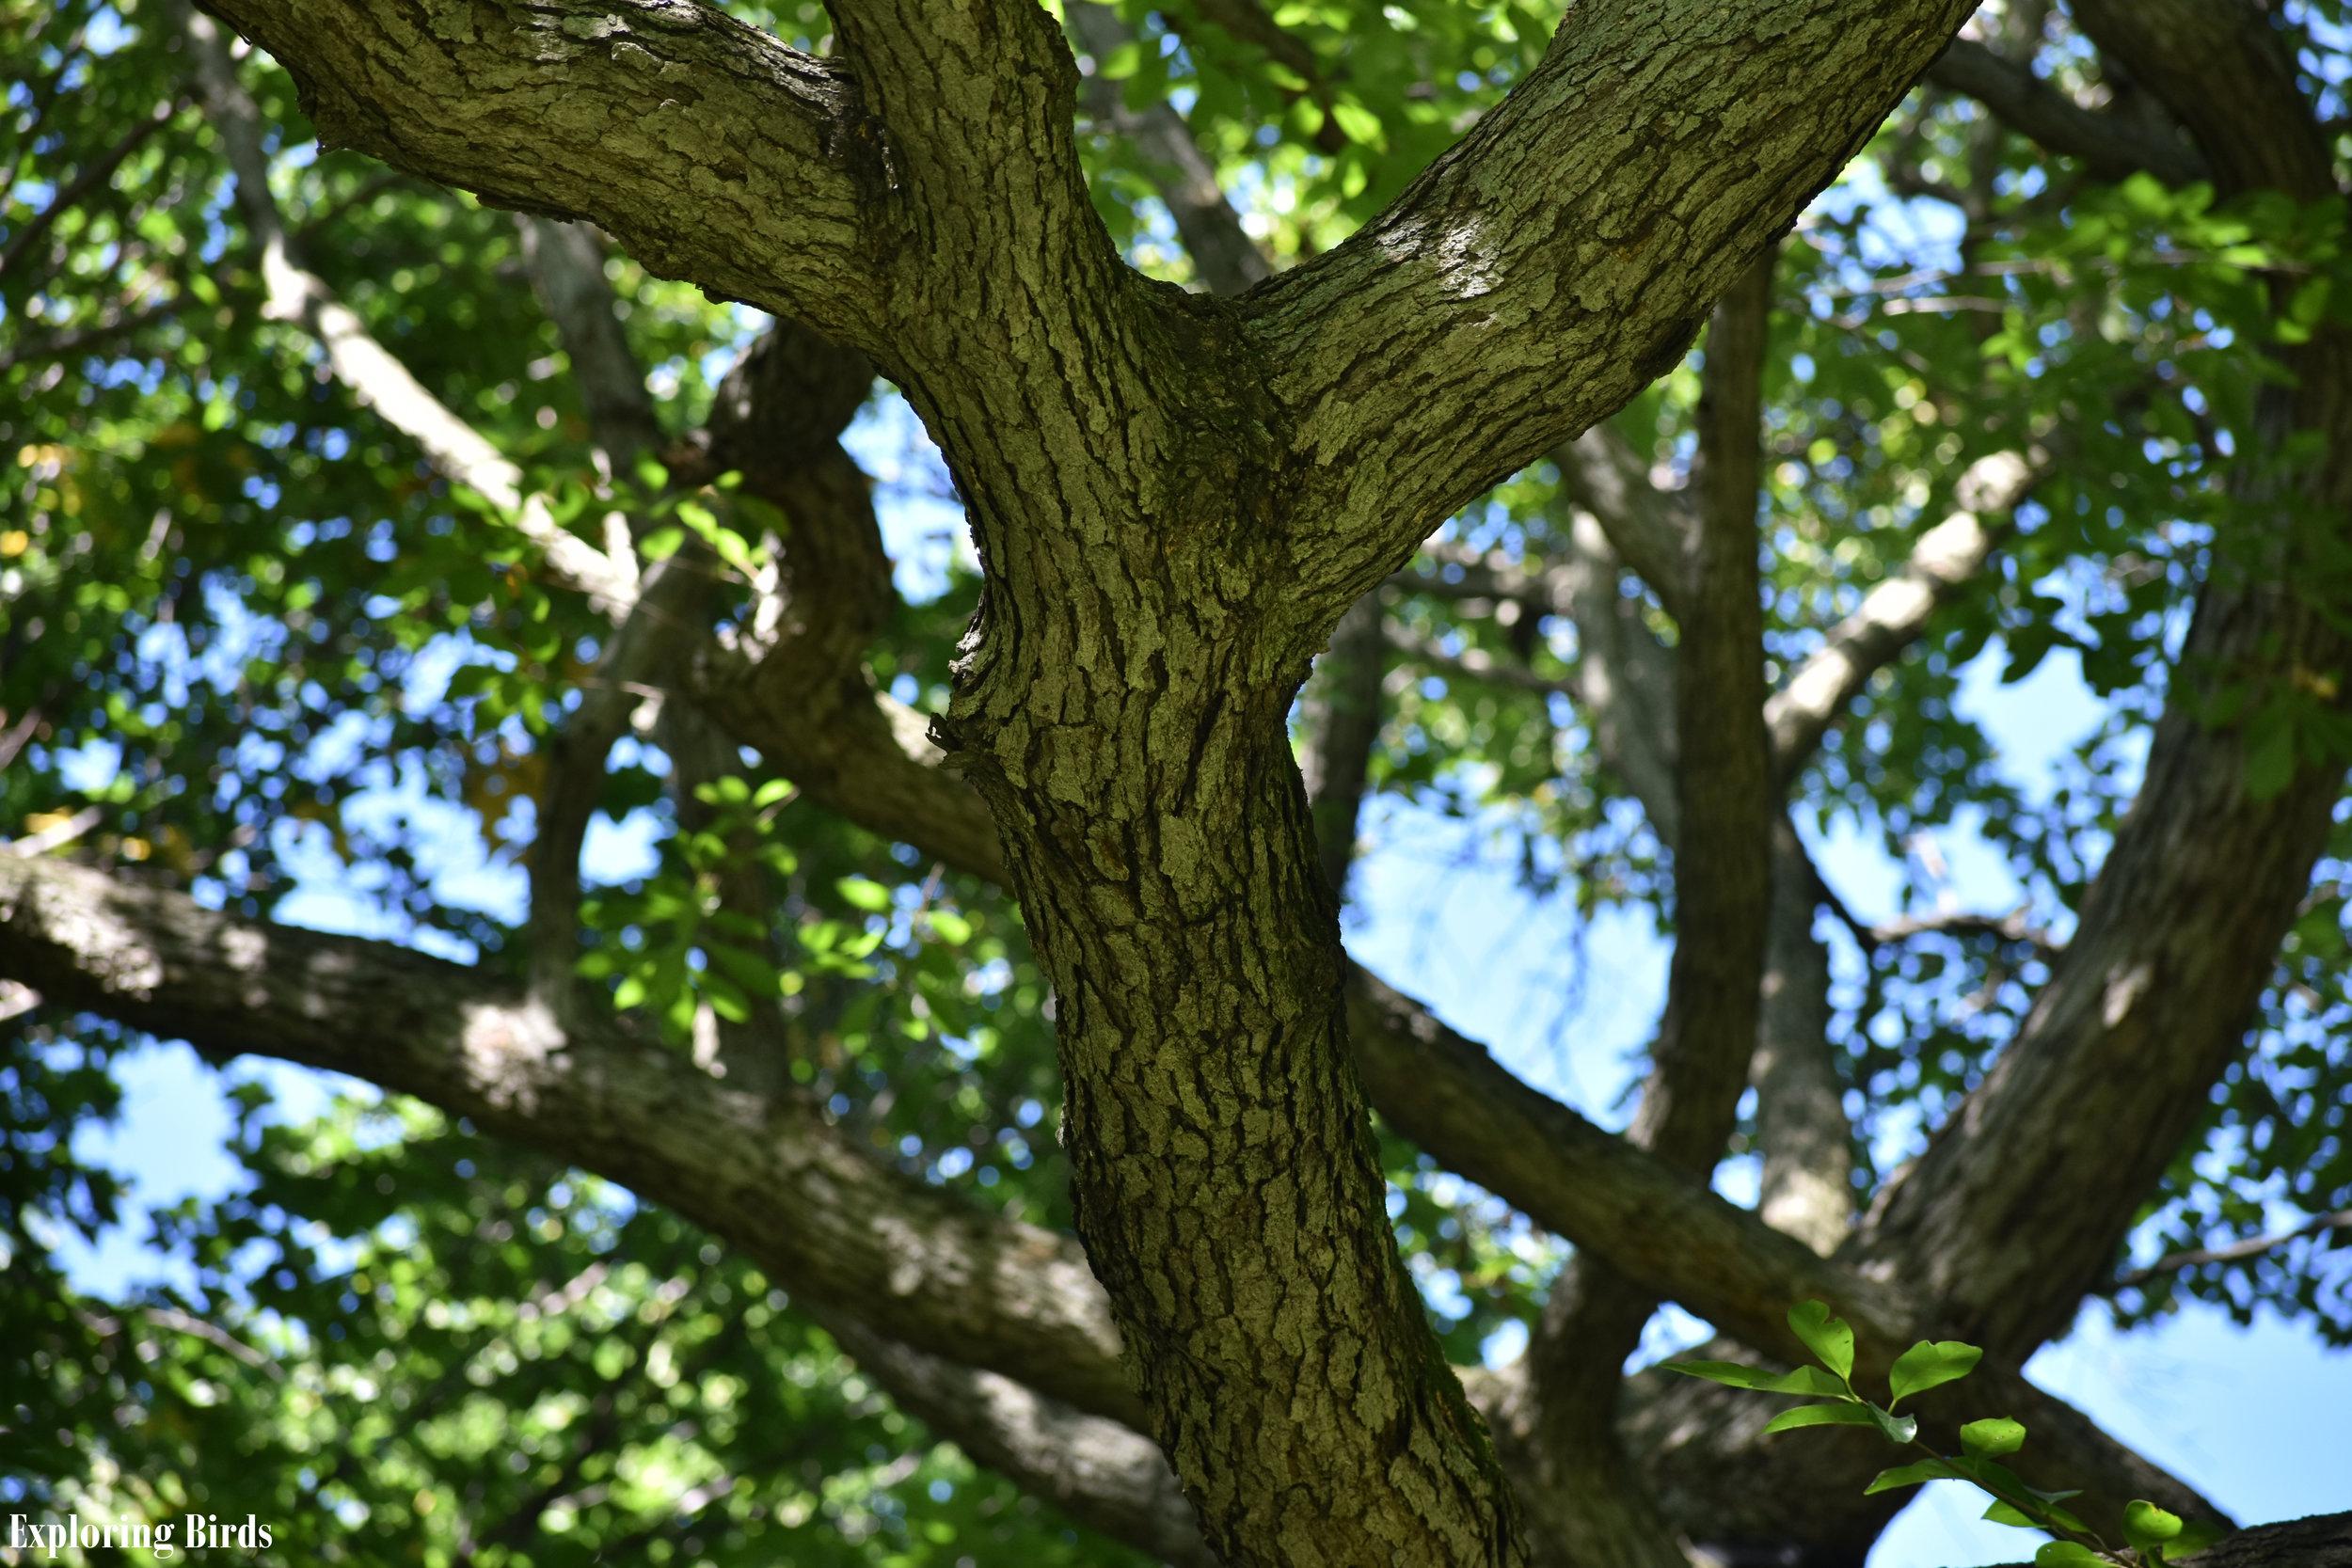 Blackgum trees attract many birds